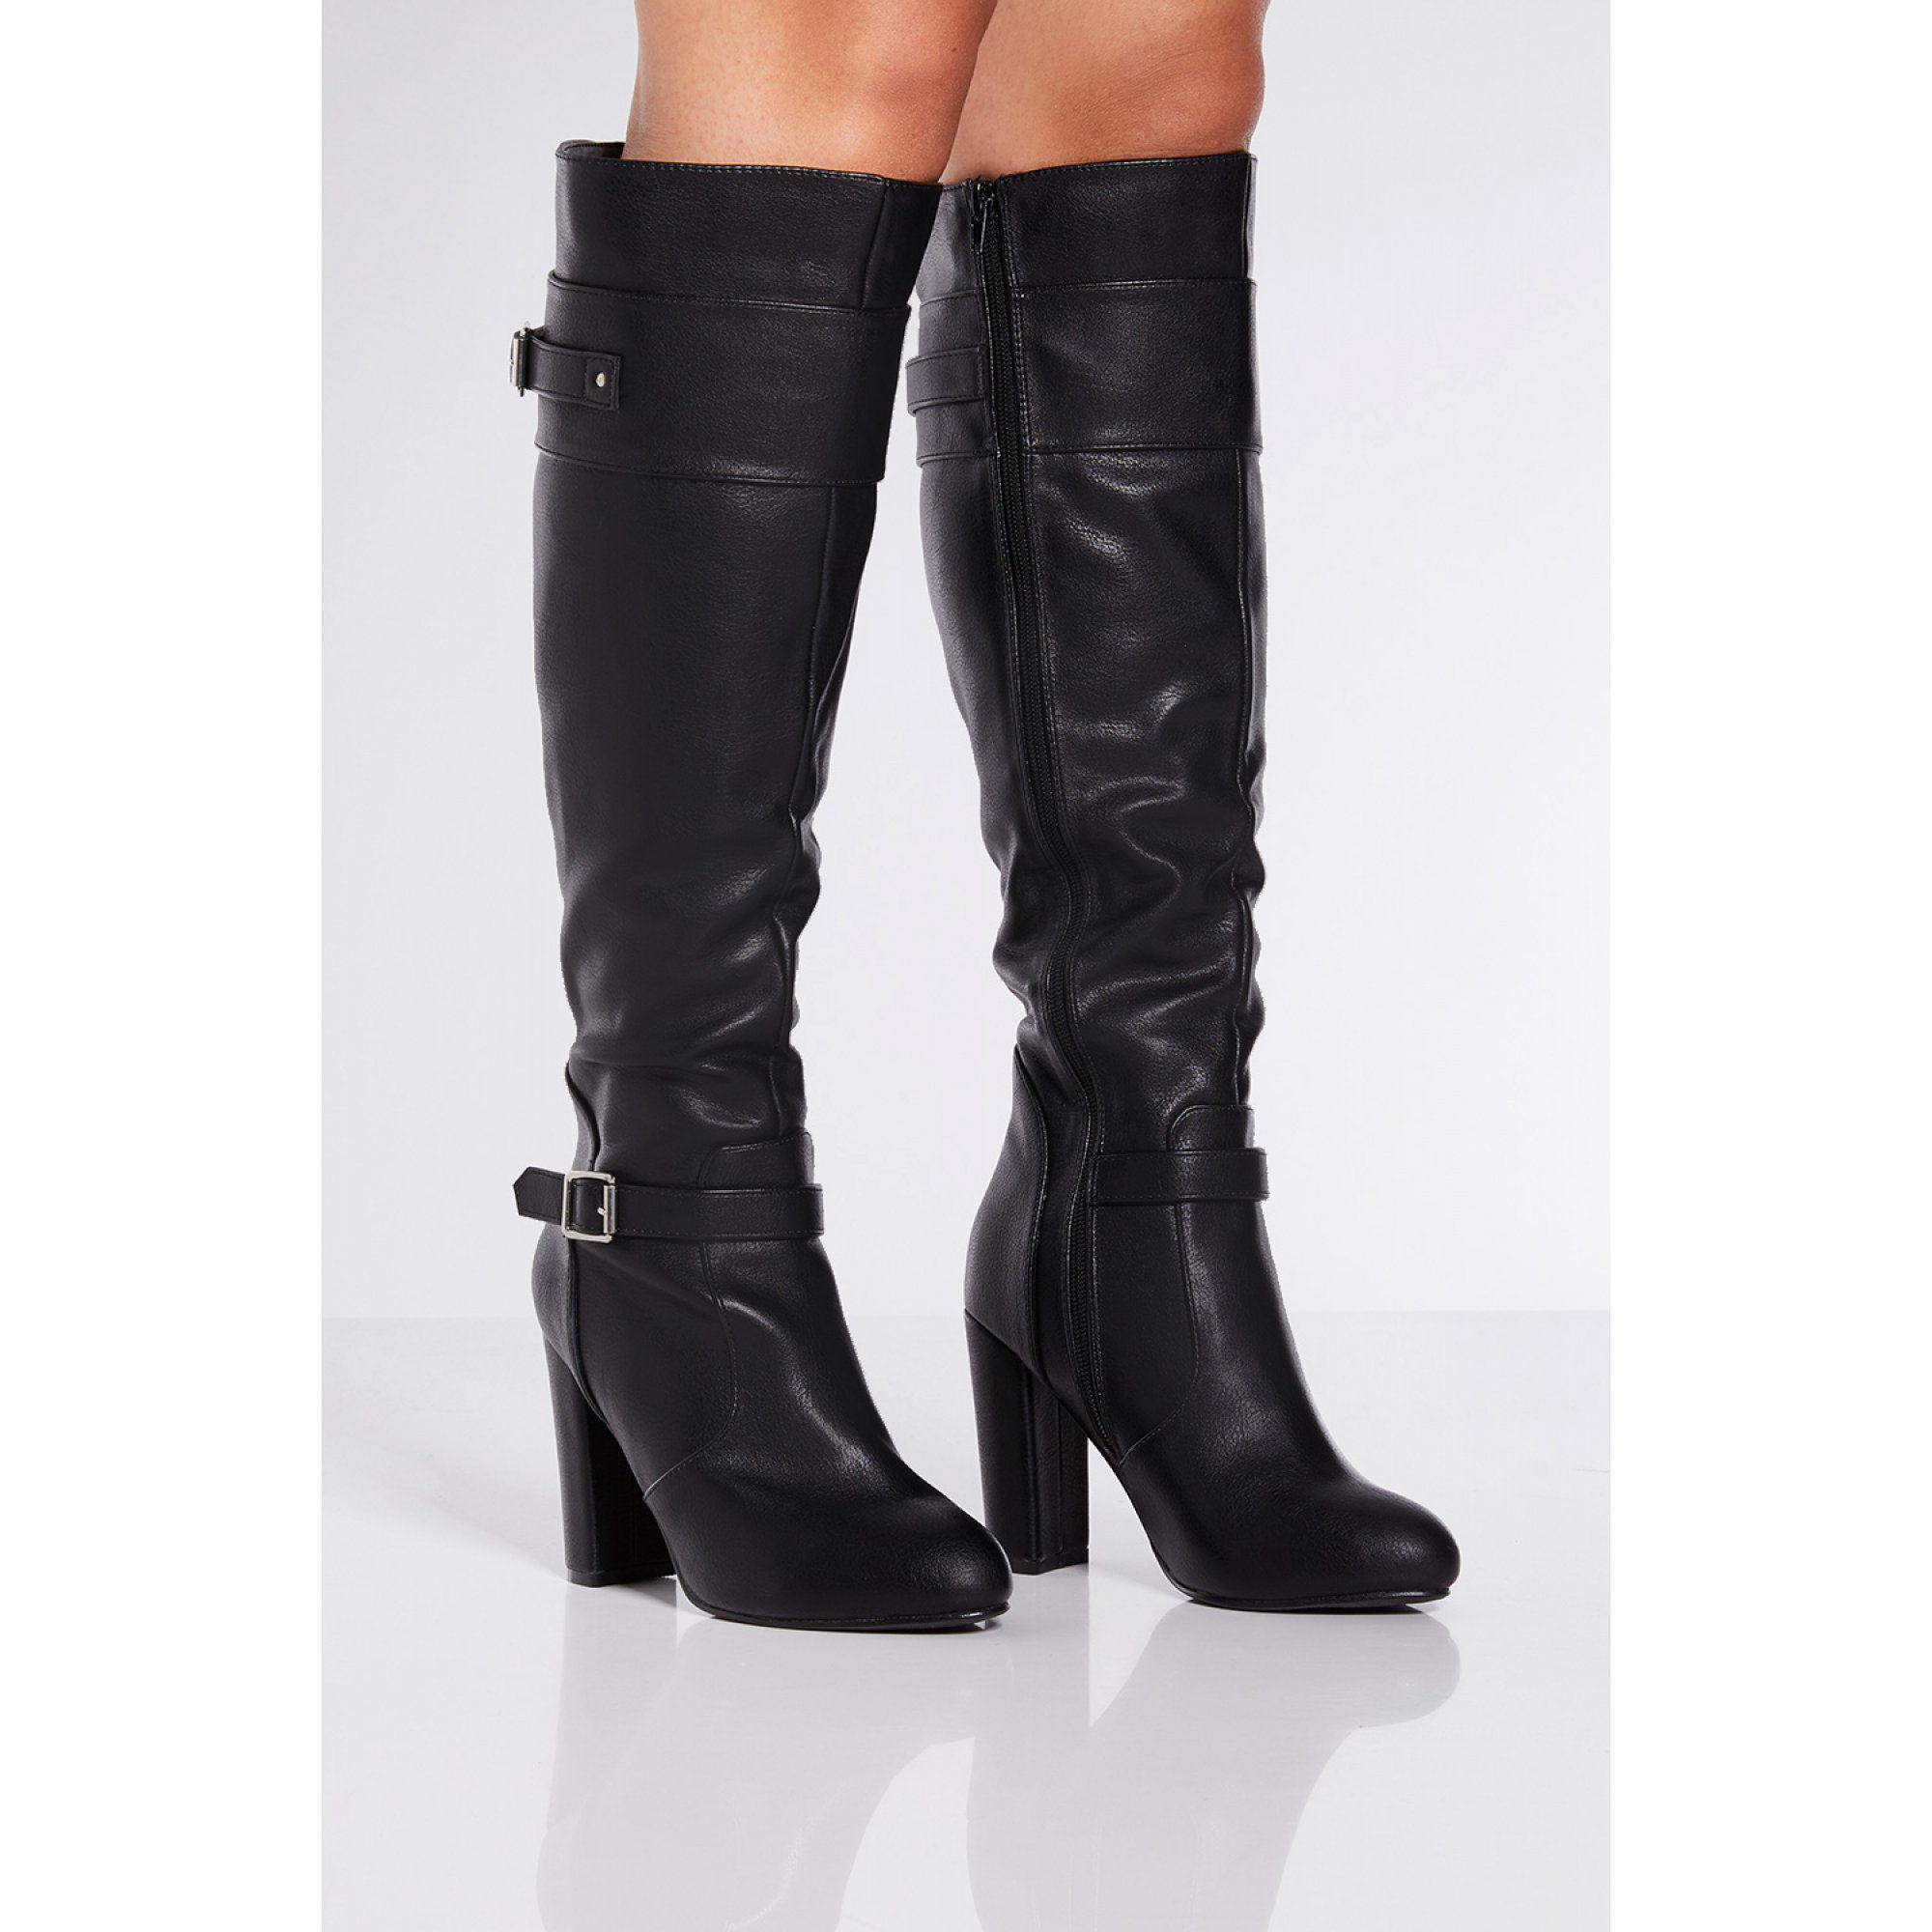 4b1101308be0 Quiz Black Buckle Strap Block Heel Long Boots in Black - Lyst